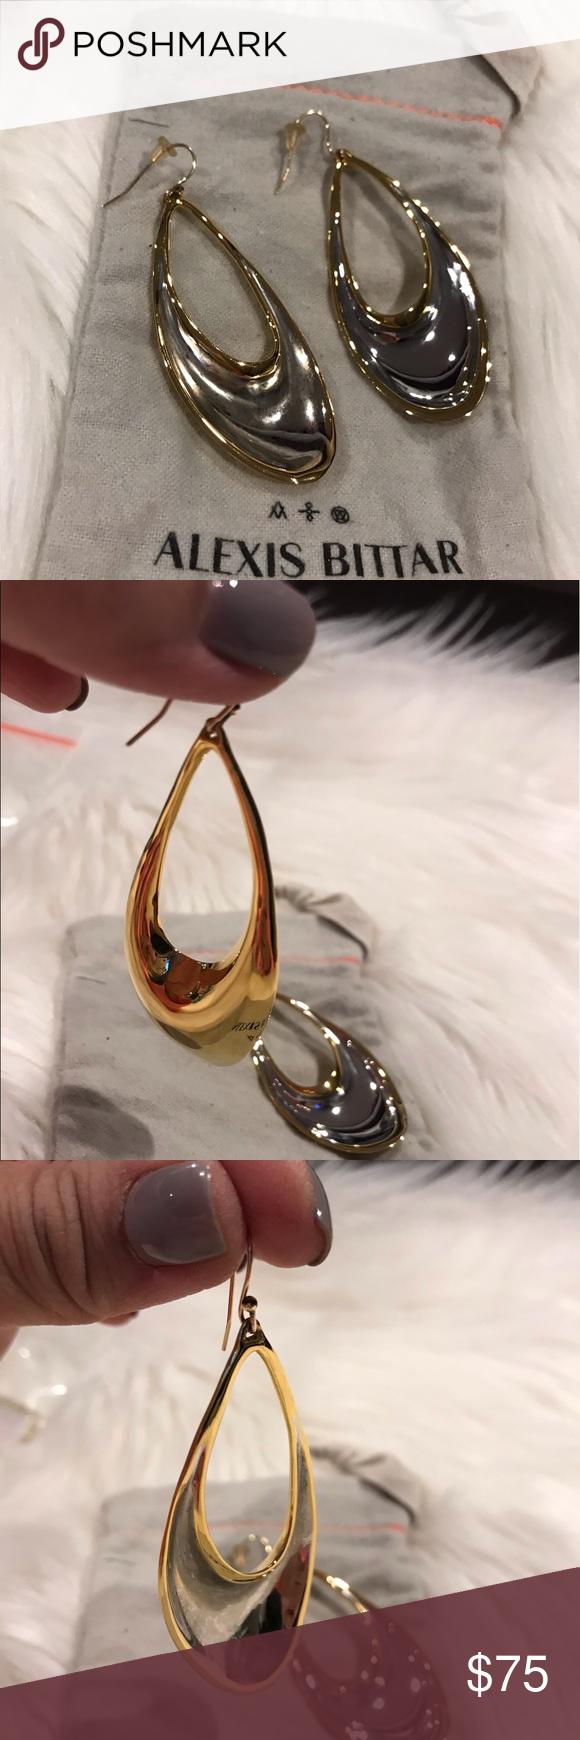 Alexis Bittar Miss Havisham Liquid Link Drop Beautiful Silver And Gold Earring Conditions